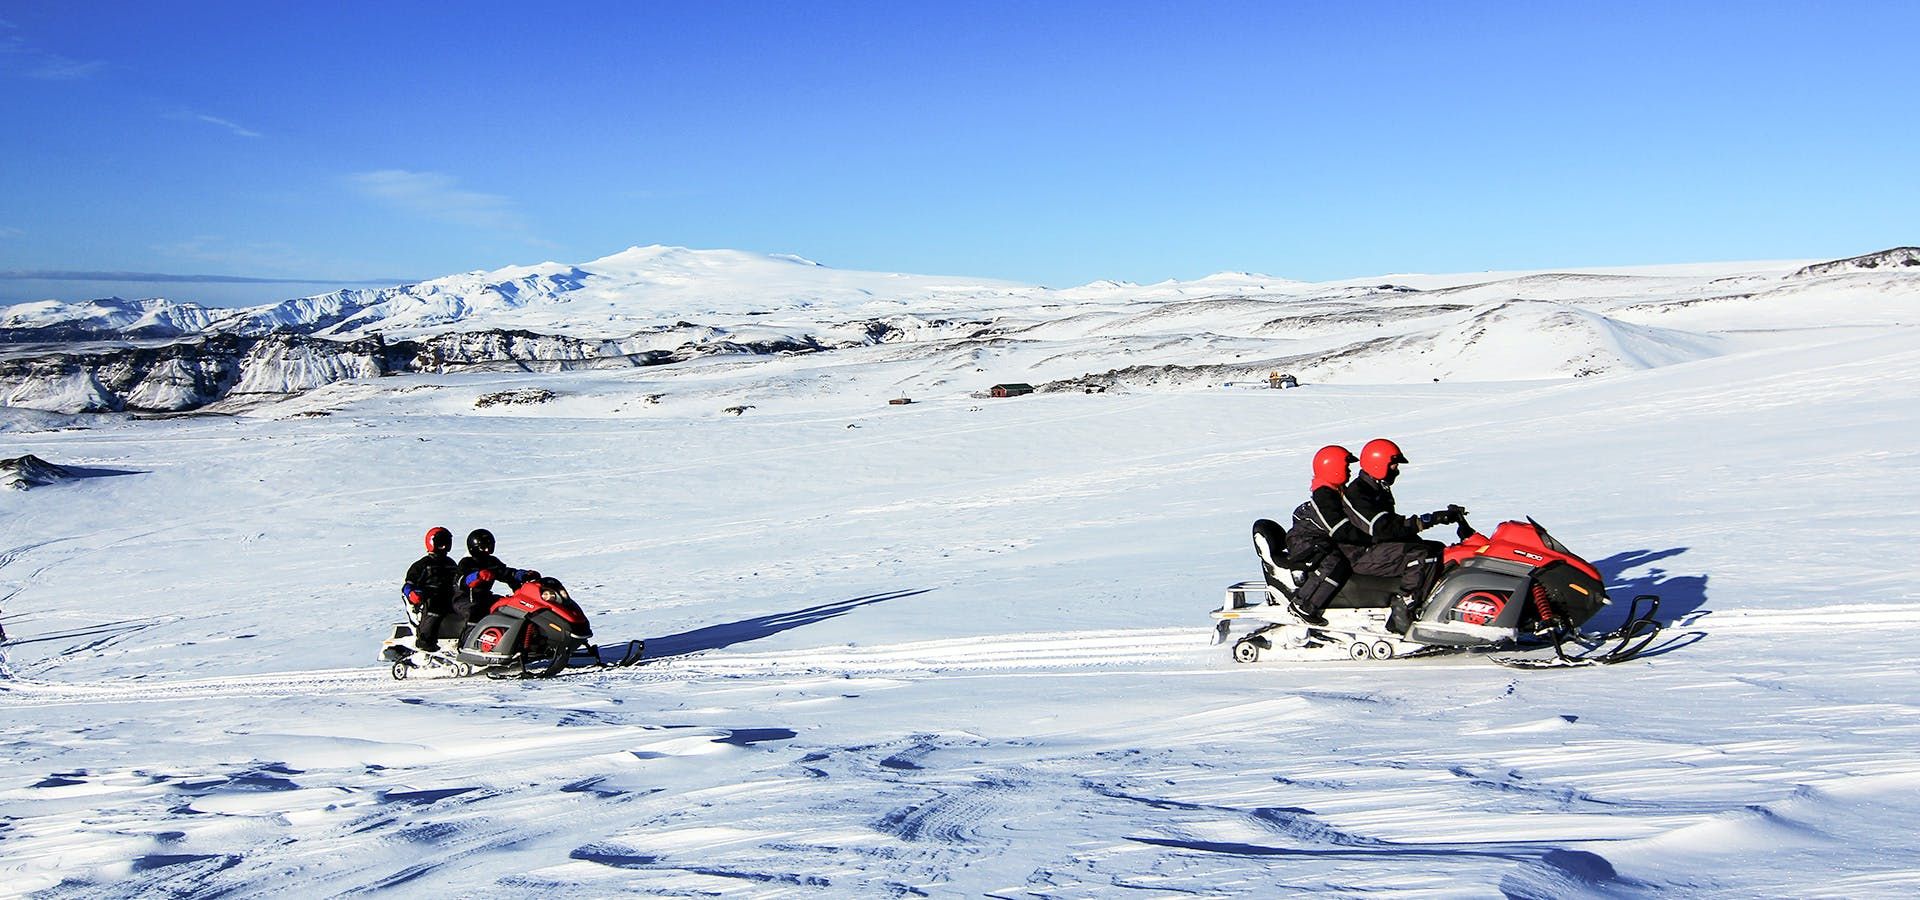 Snowmobile Tour on Mýrdalsjökull Glacier